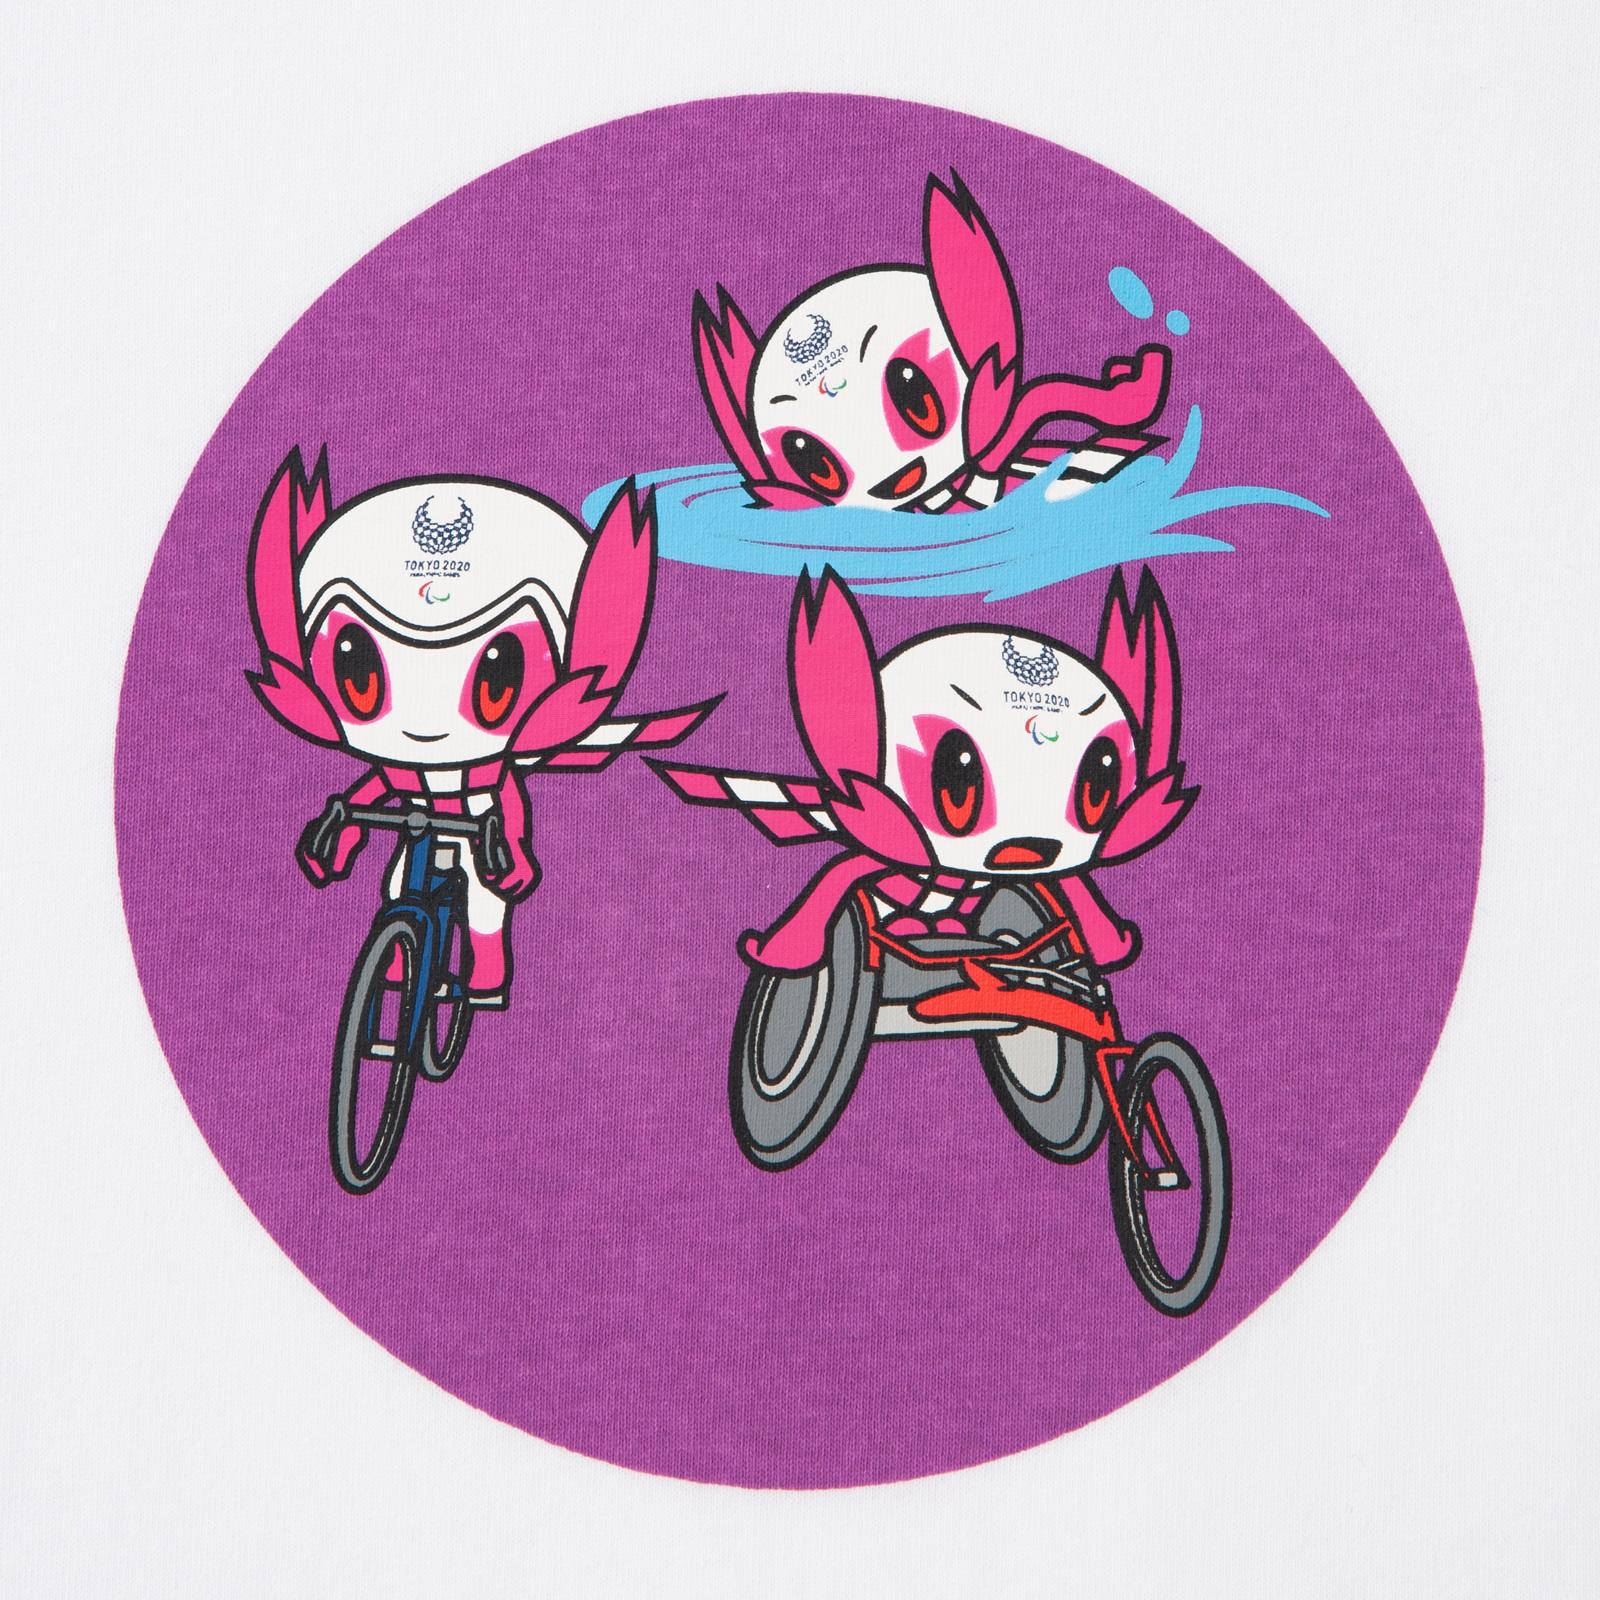 KIDSTシャツトライアスロン(東京2020パラリンピックマスコット)